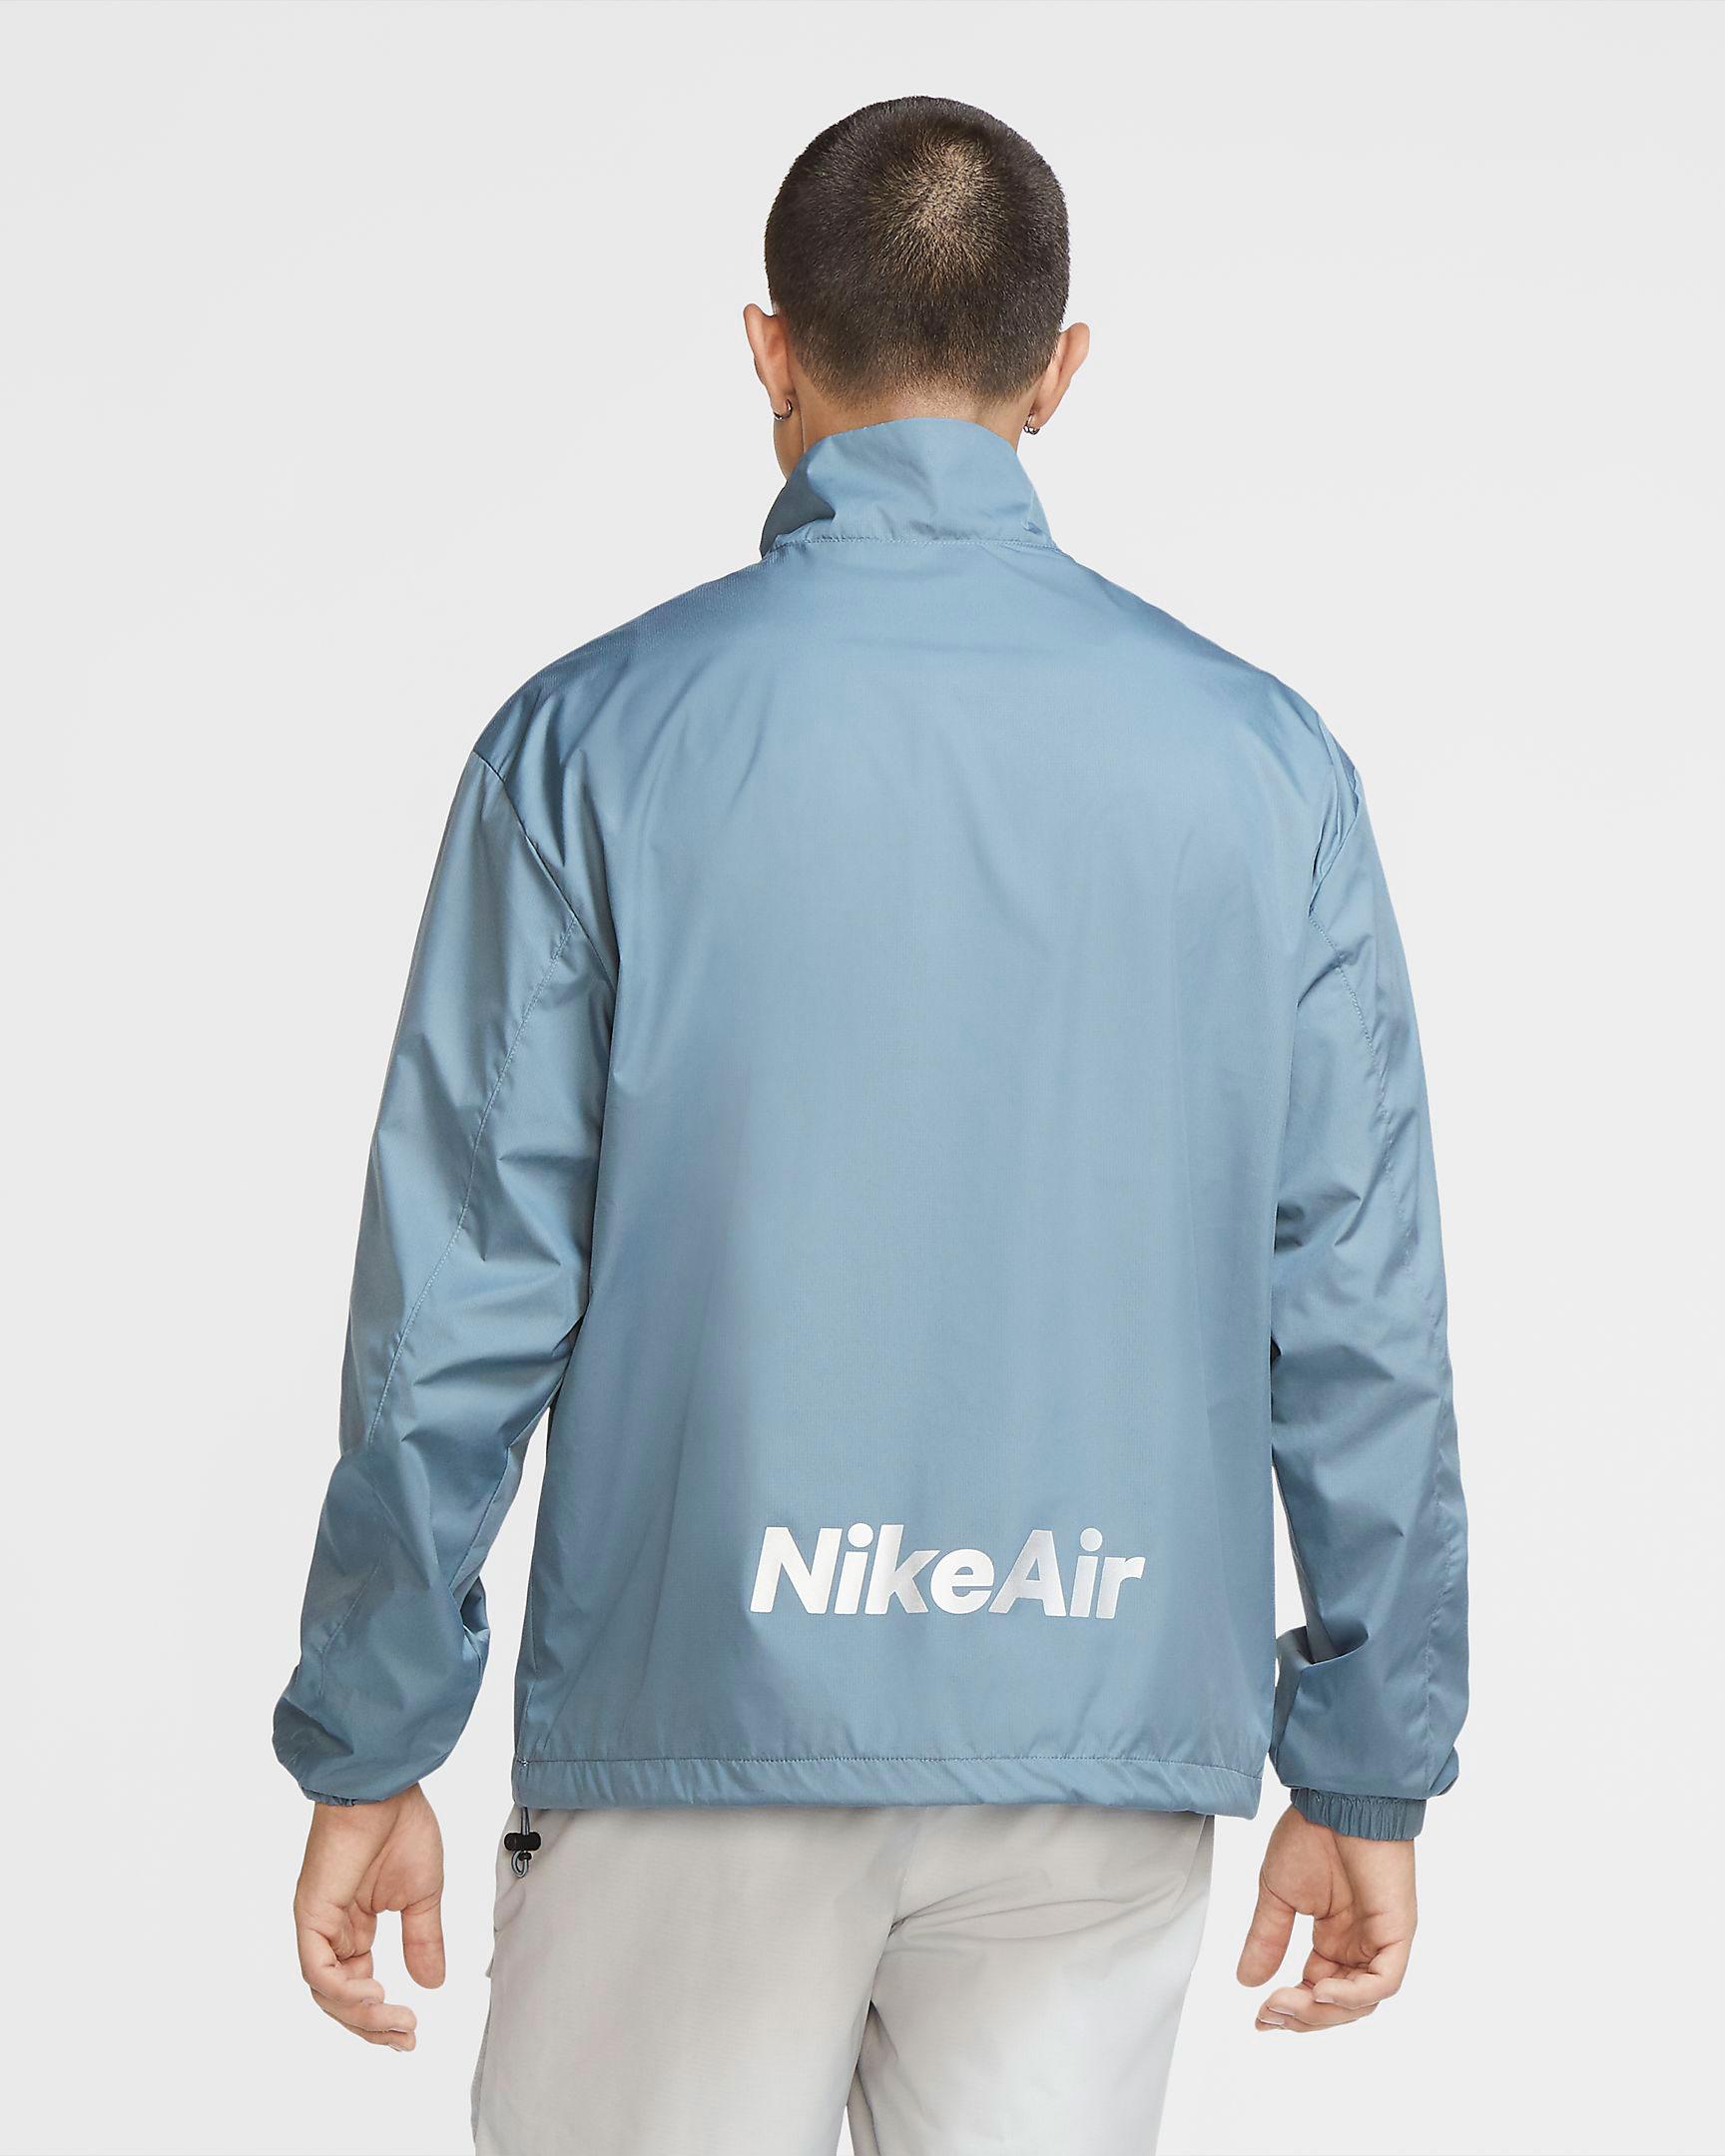 nike-kobe-ad-nxt-blue-hero-jacket-match-2